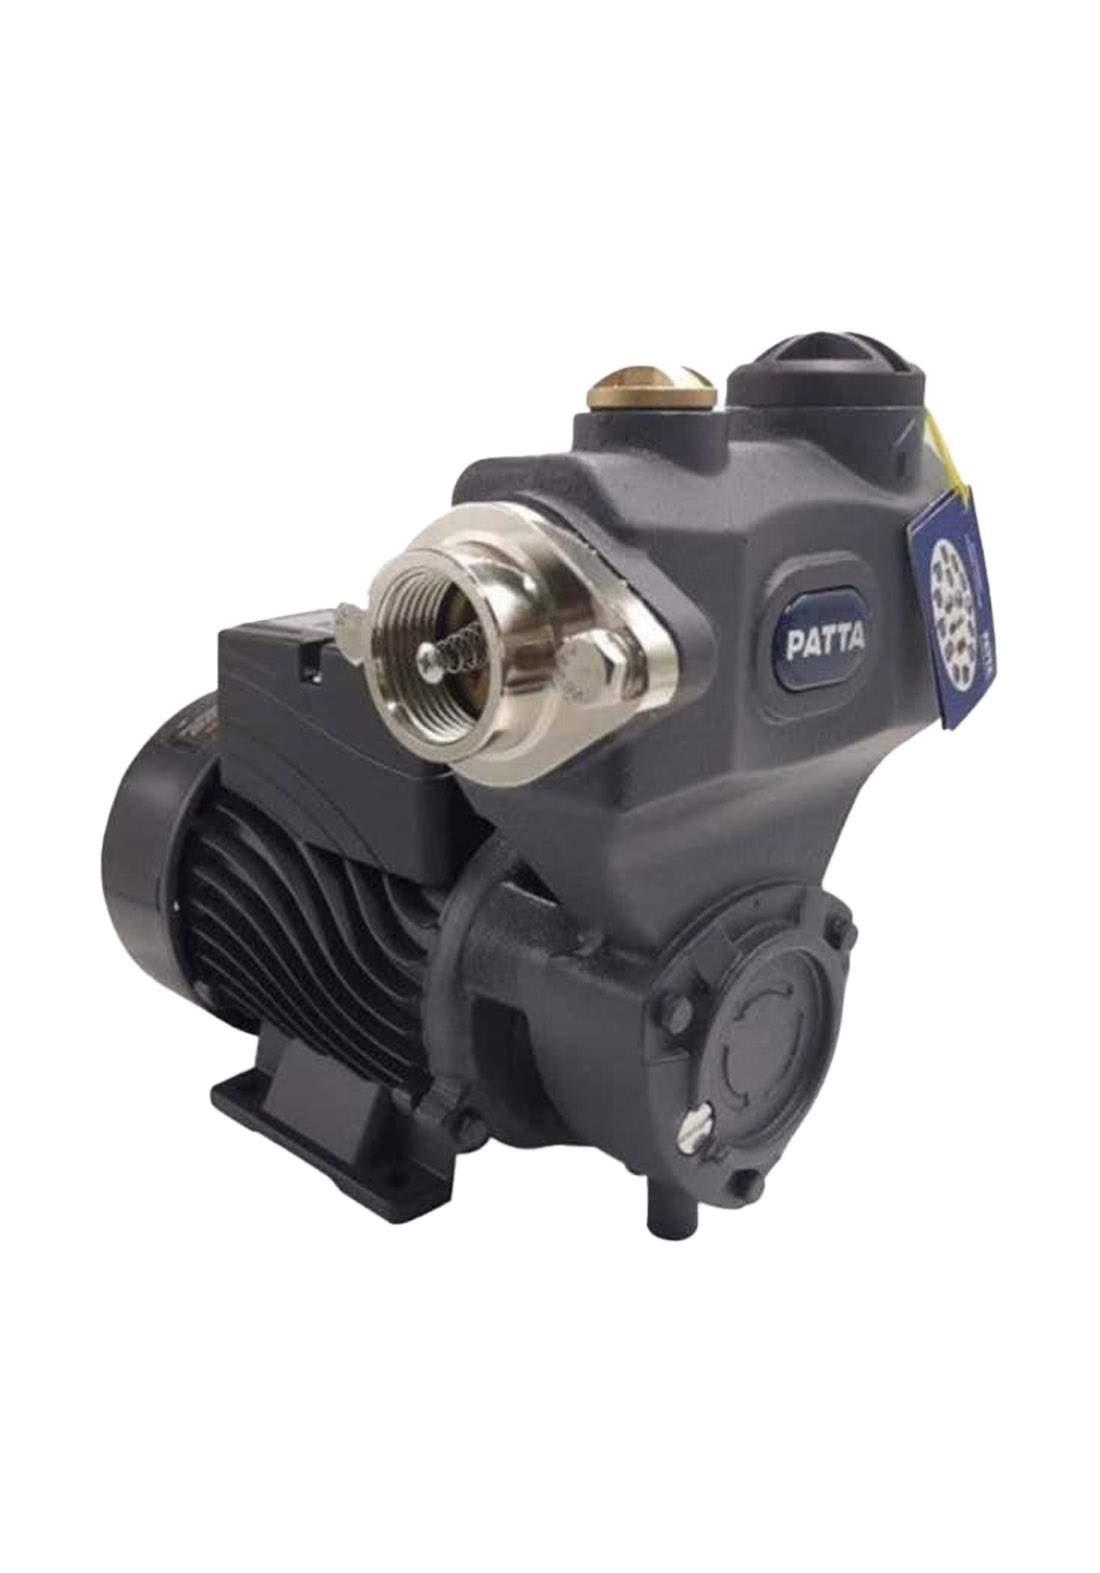 Patta PATWZB-35S Domestic Water Pump  550 W ماطور مياه